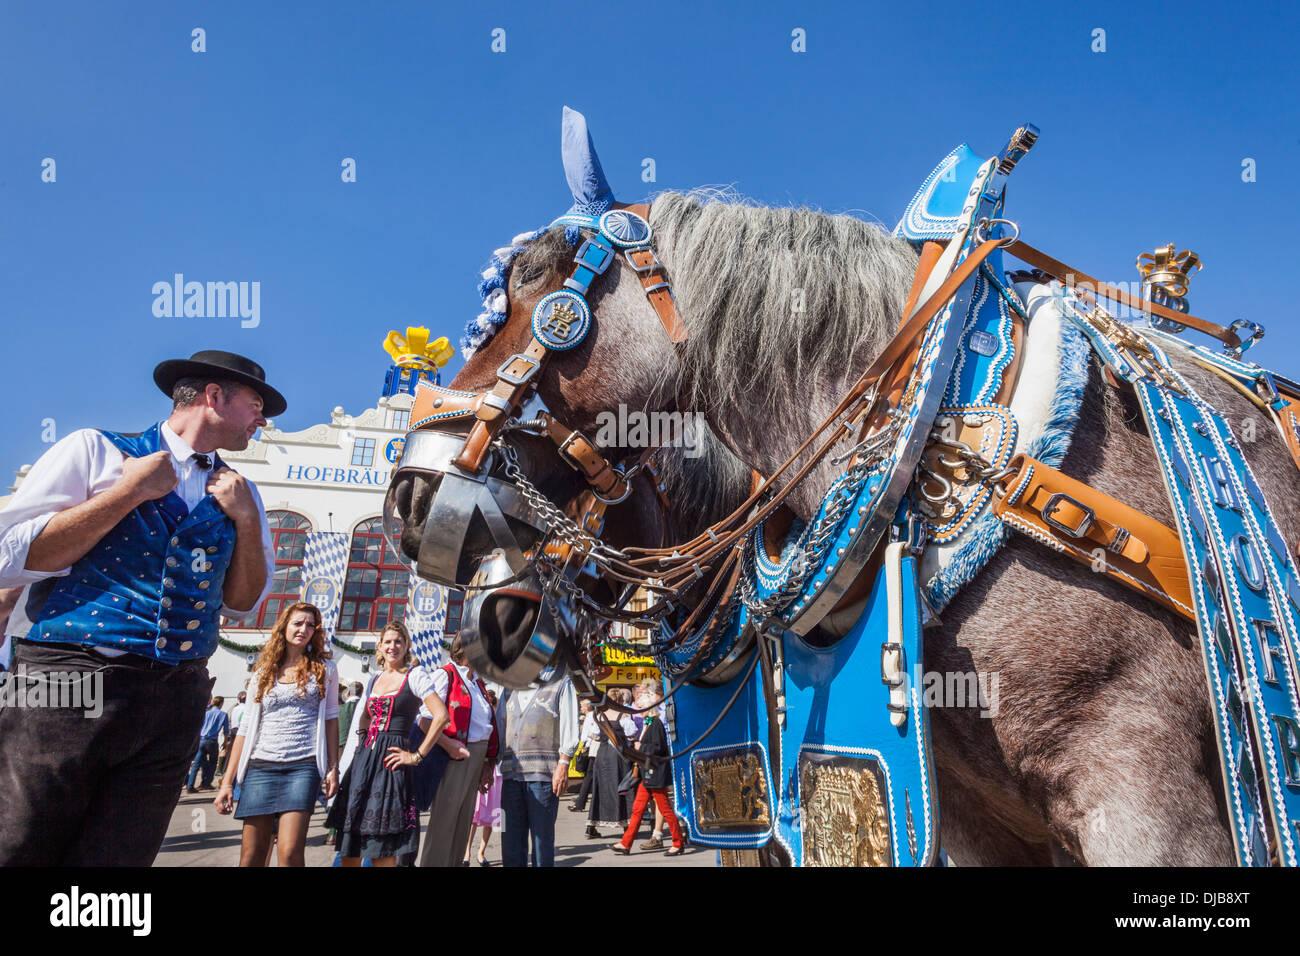 Germany, Bavaria, Munich, Oktoberfest, Horses Dressed in Festival Livery - Stock Image